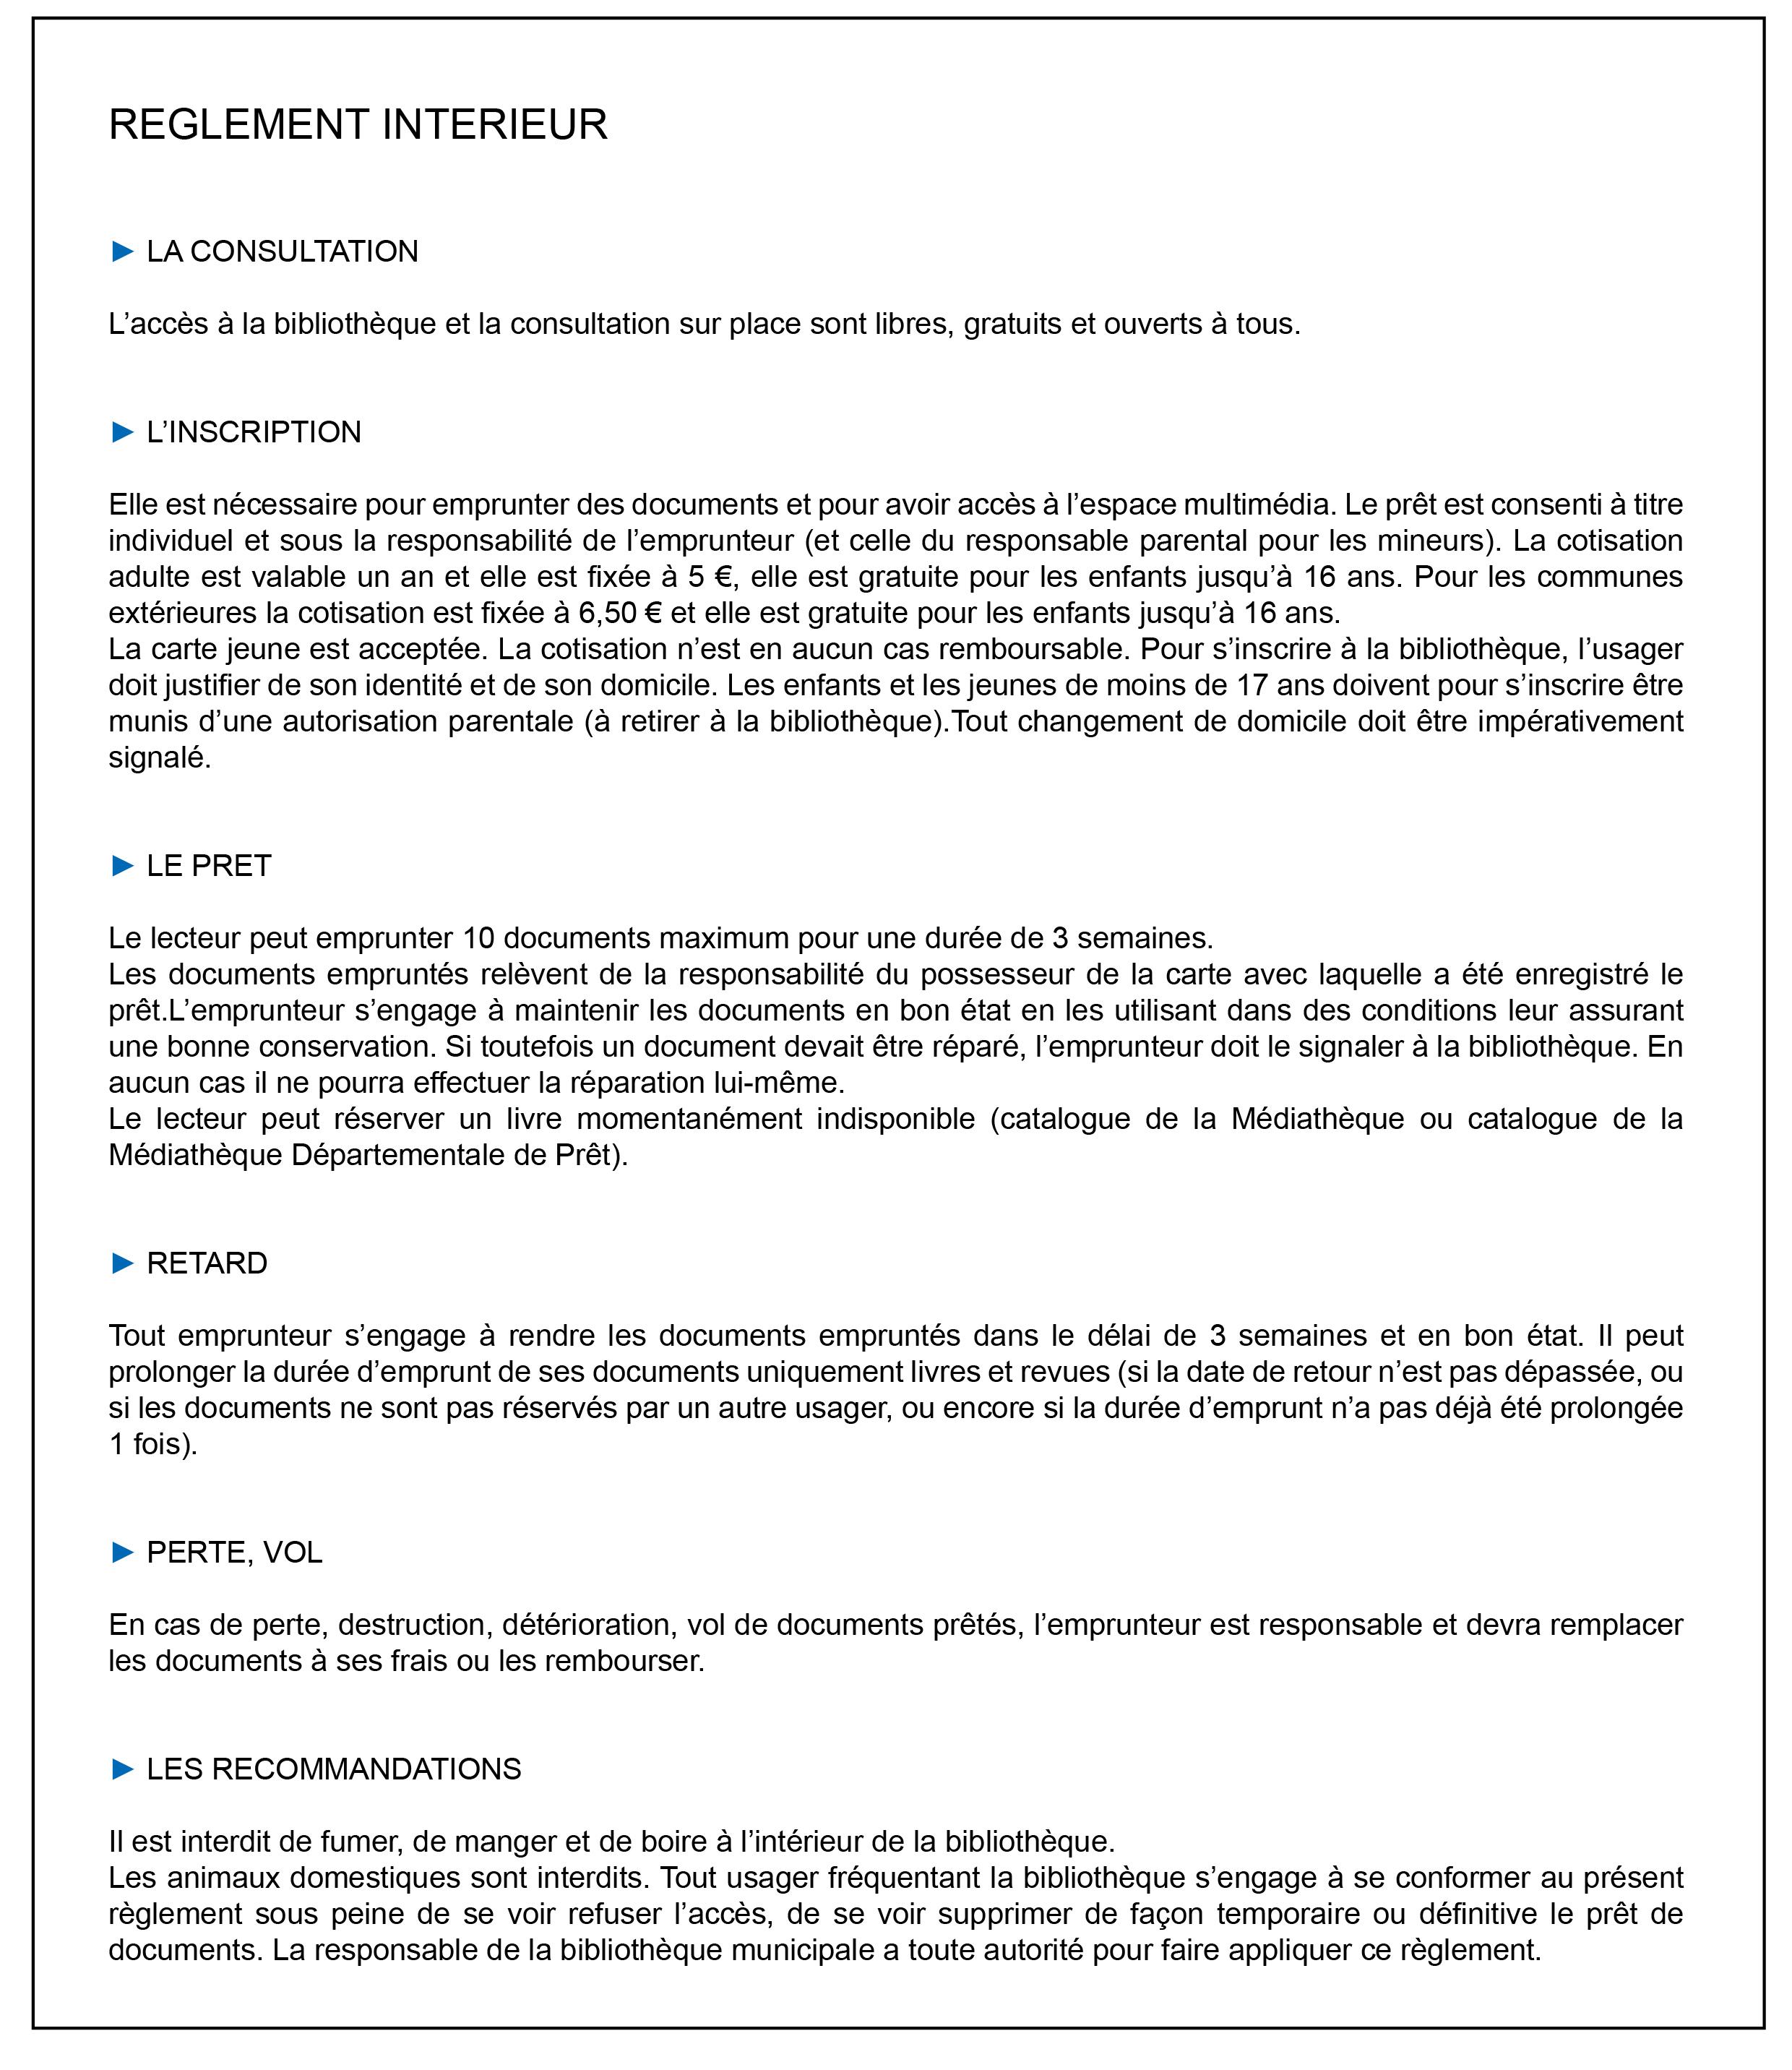 reglement-interieur-mediatheque-chemaudin